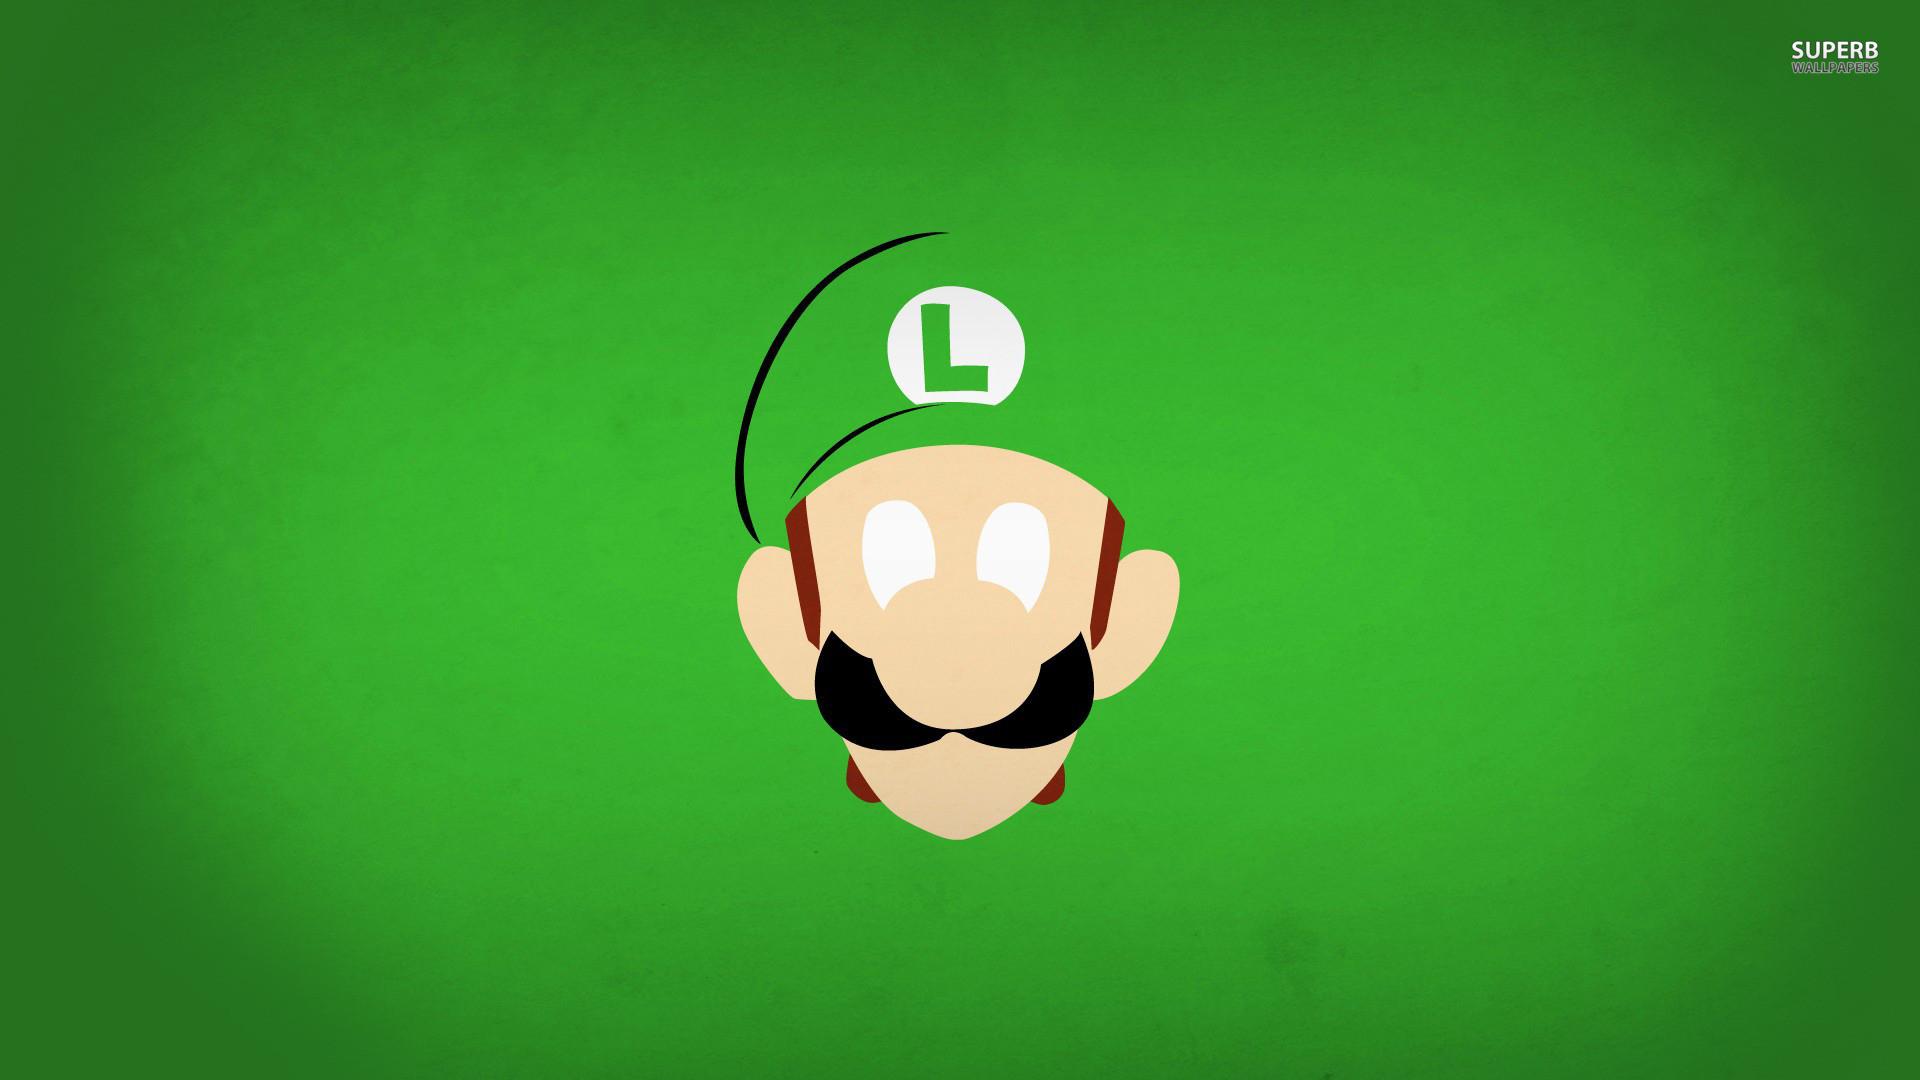 15 New Super Luigi U HD Wallpapers